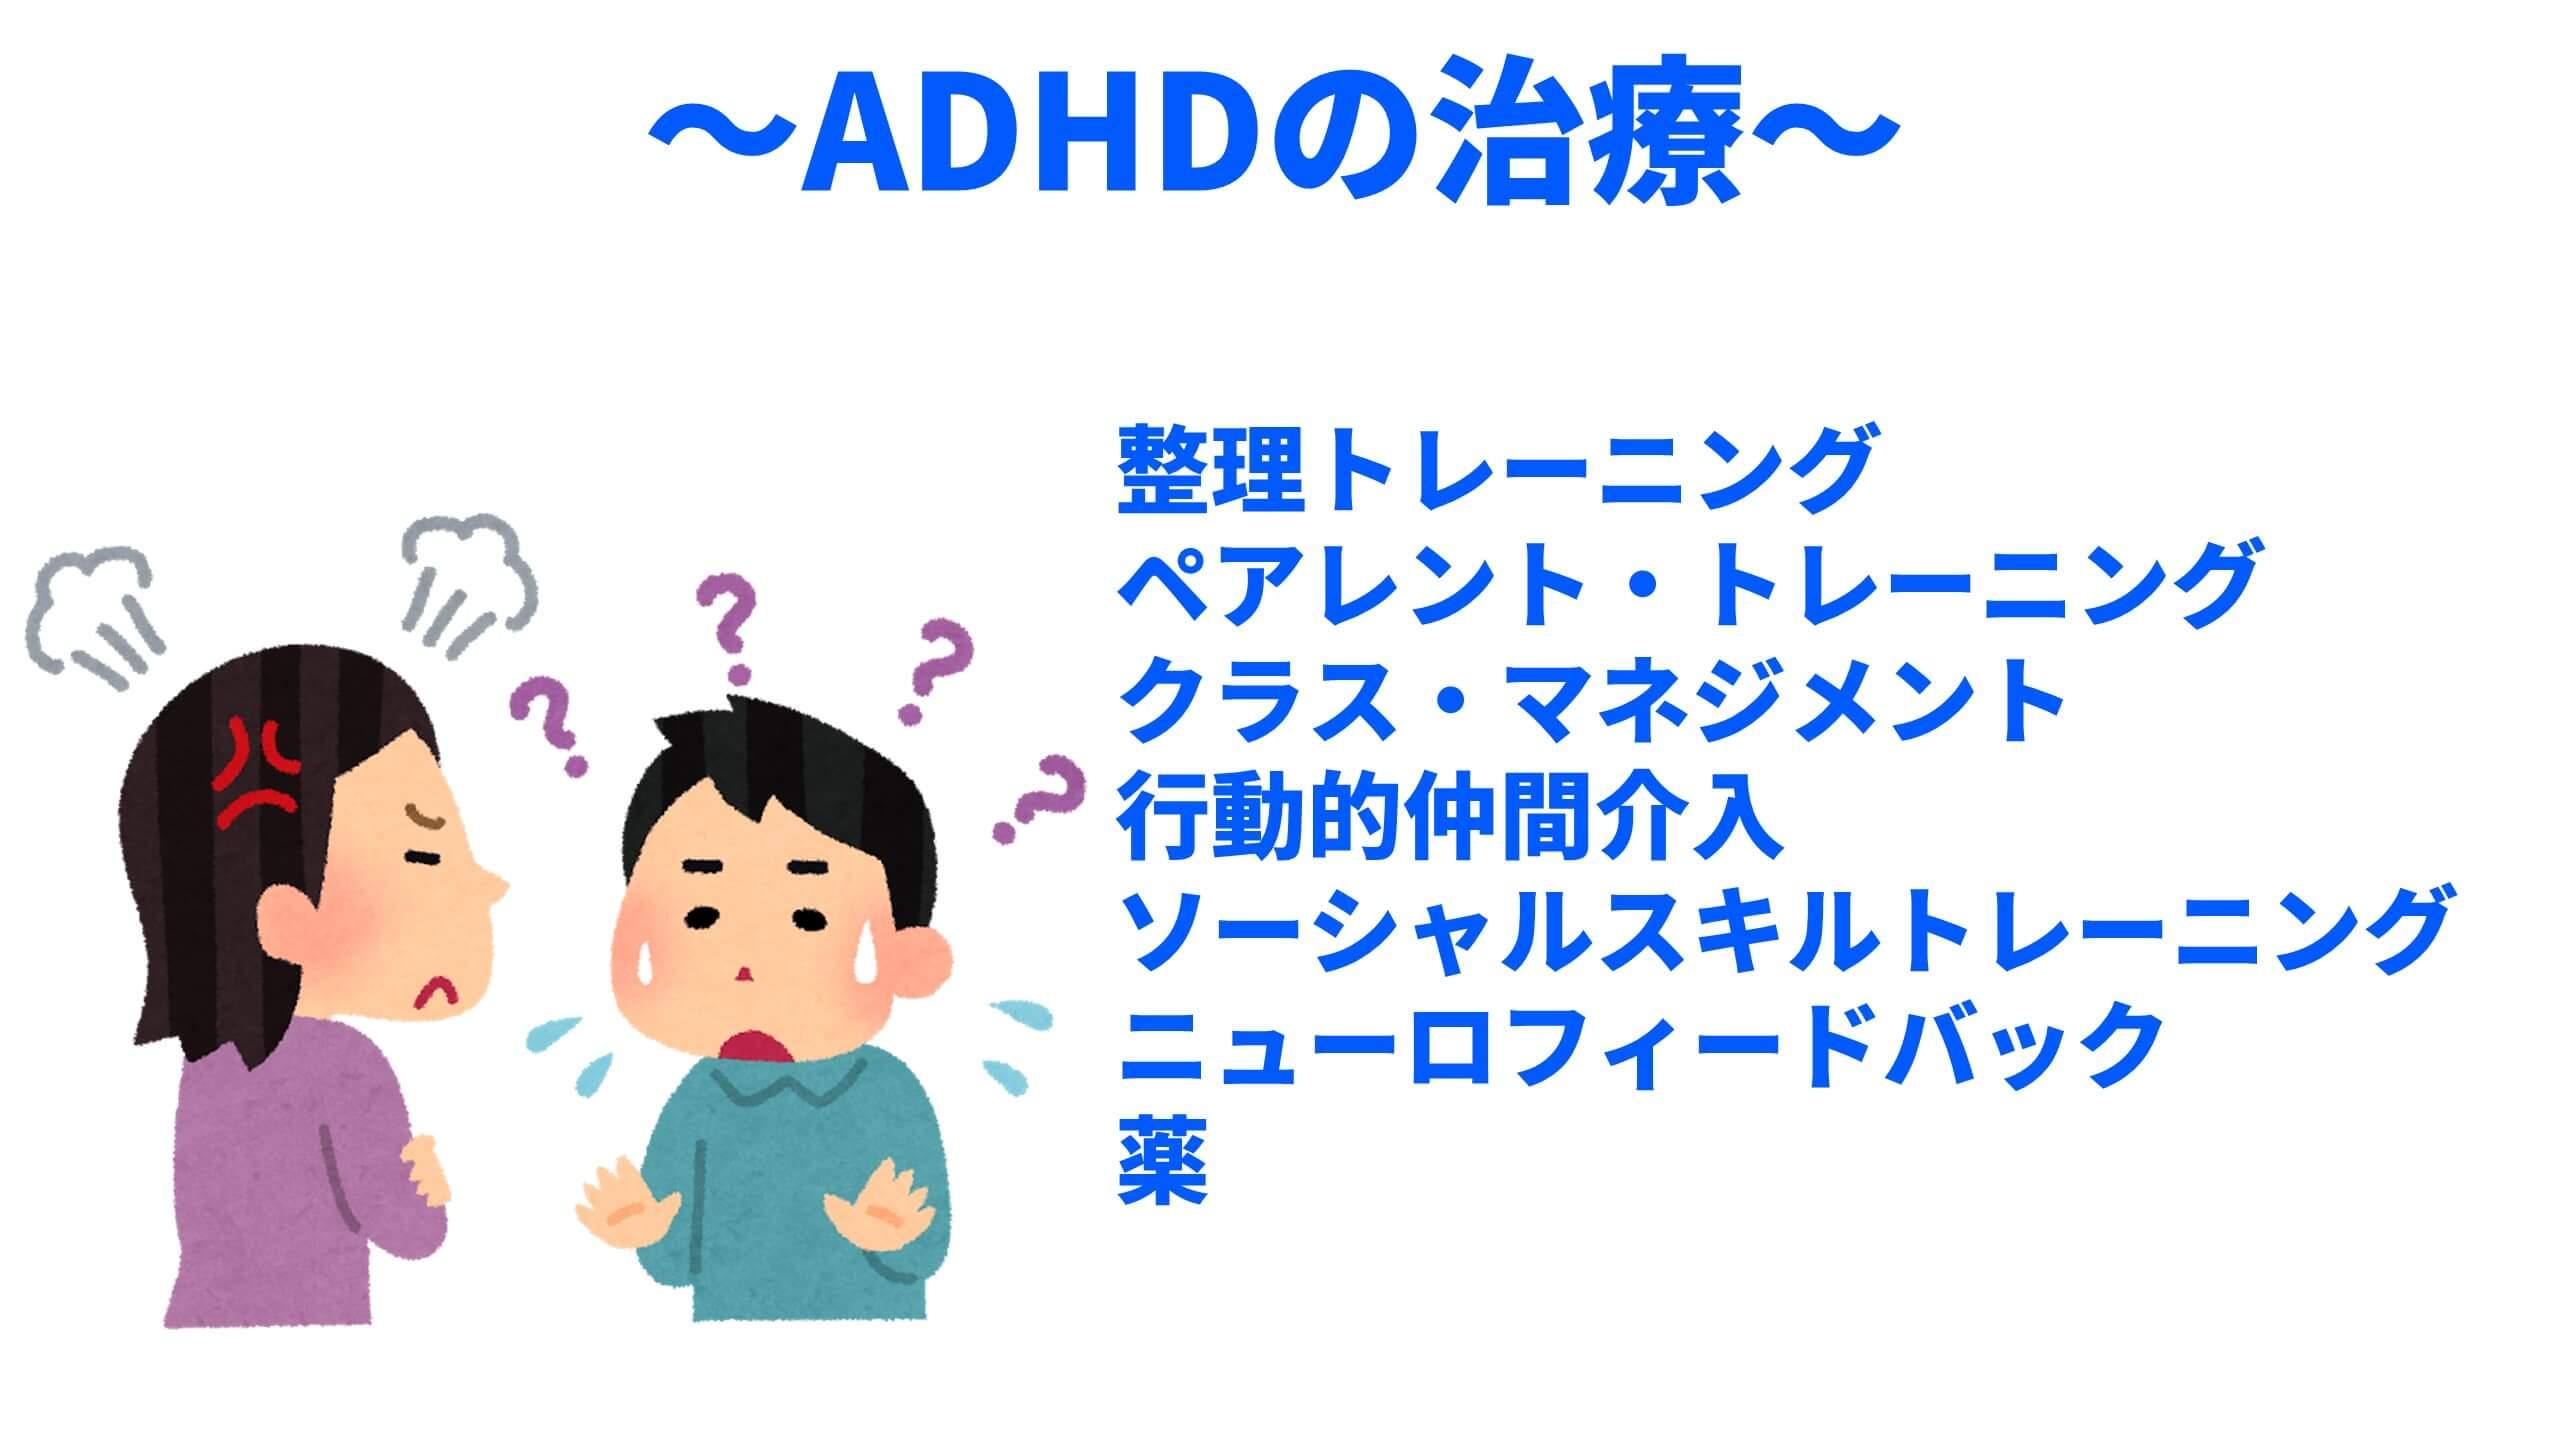 ADHDの治療法